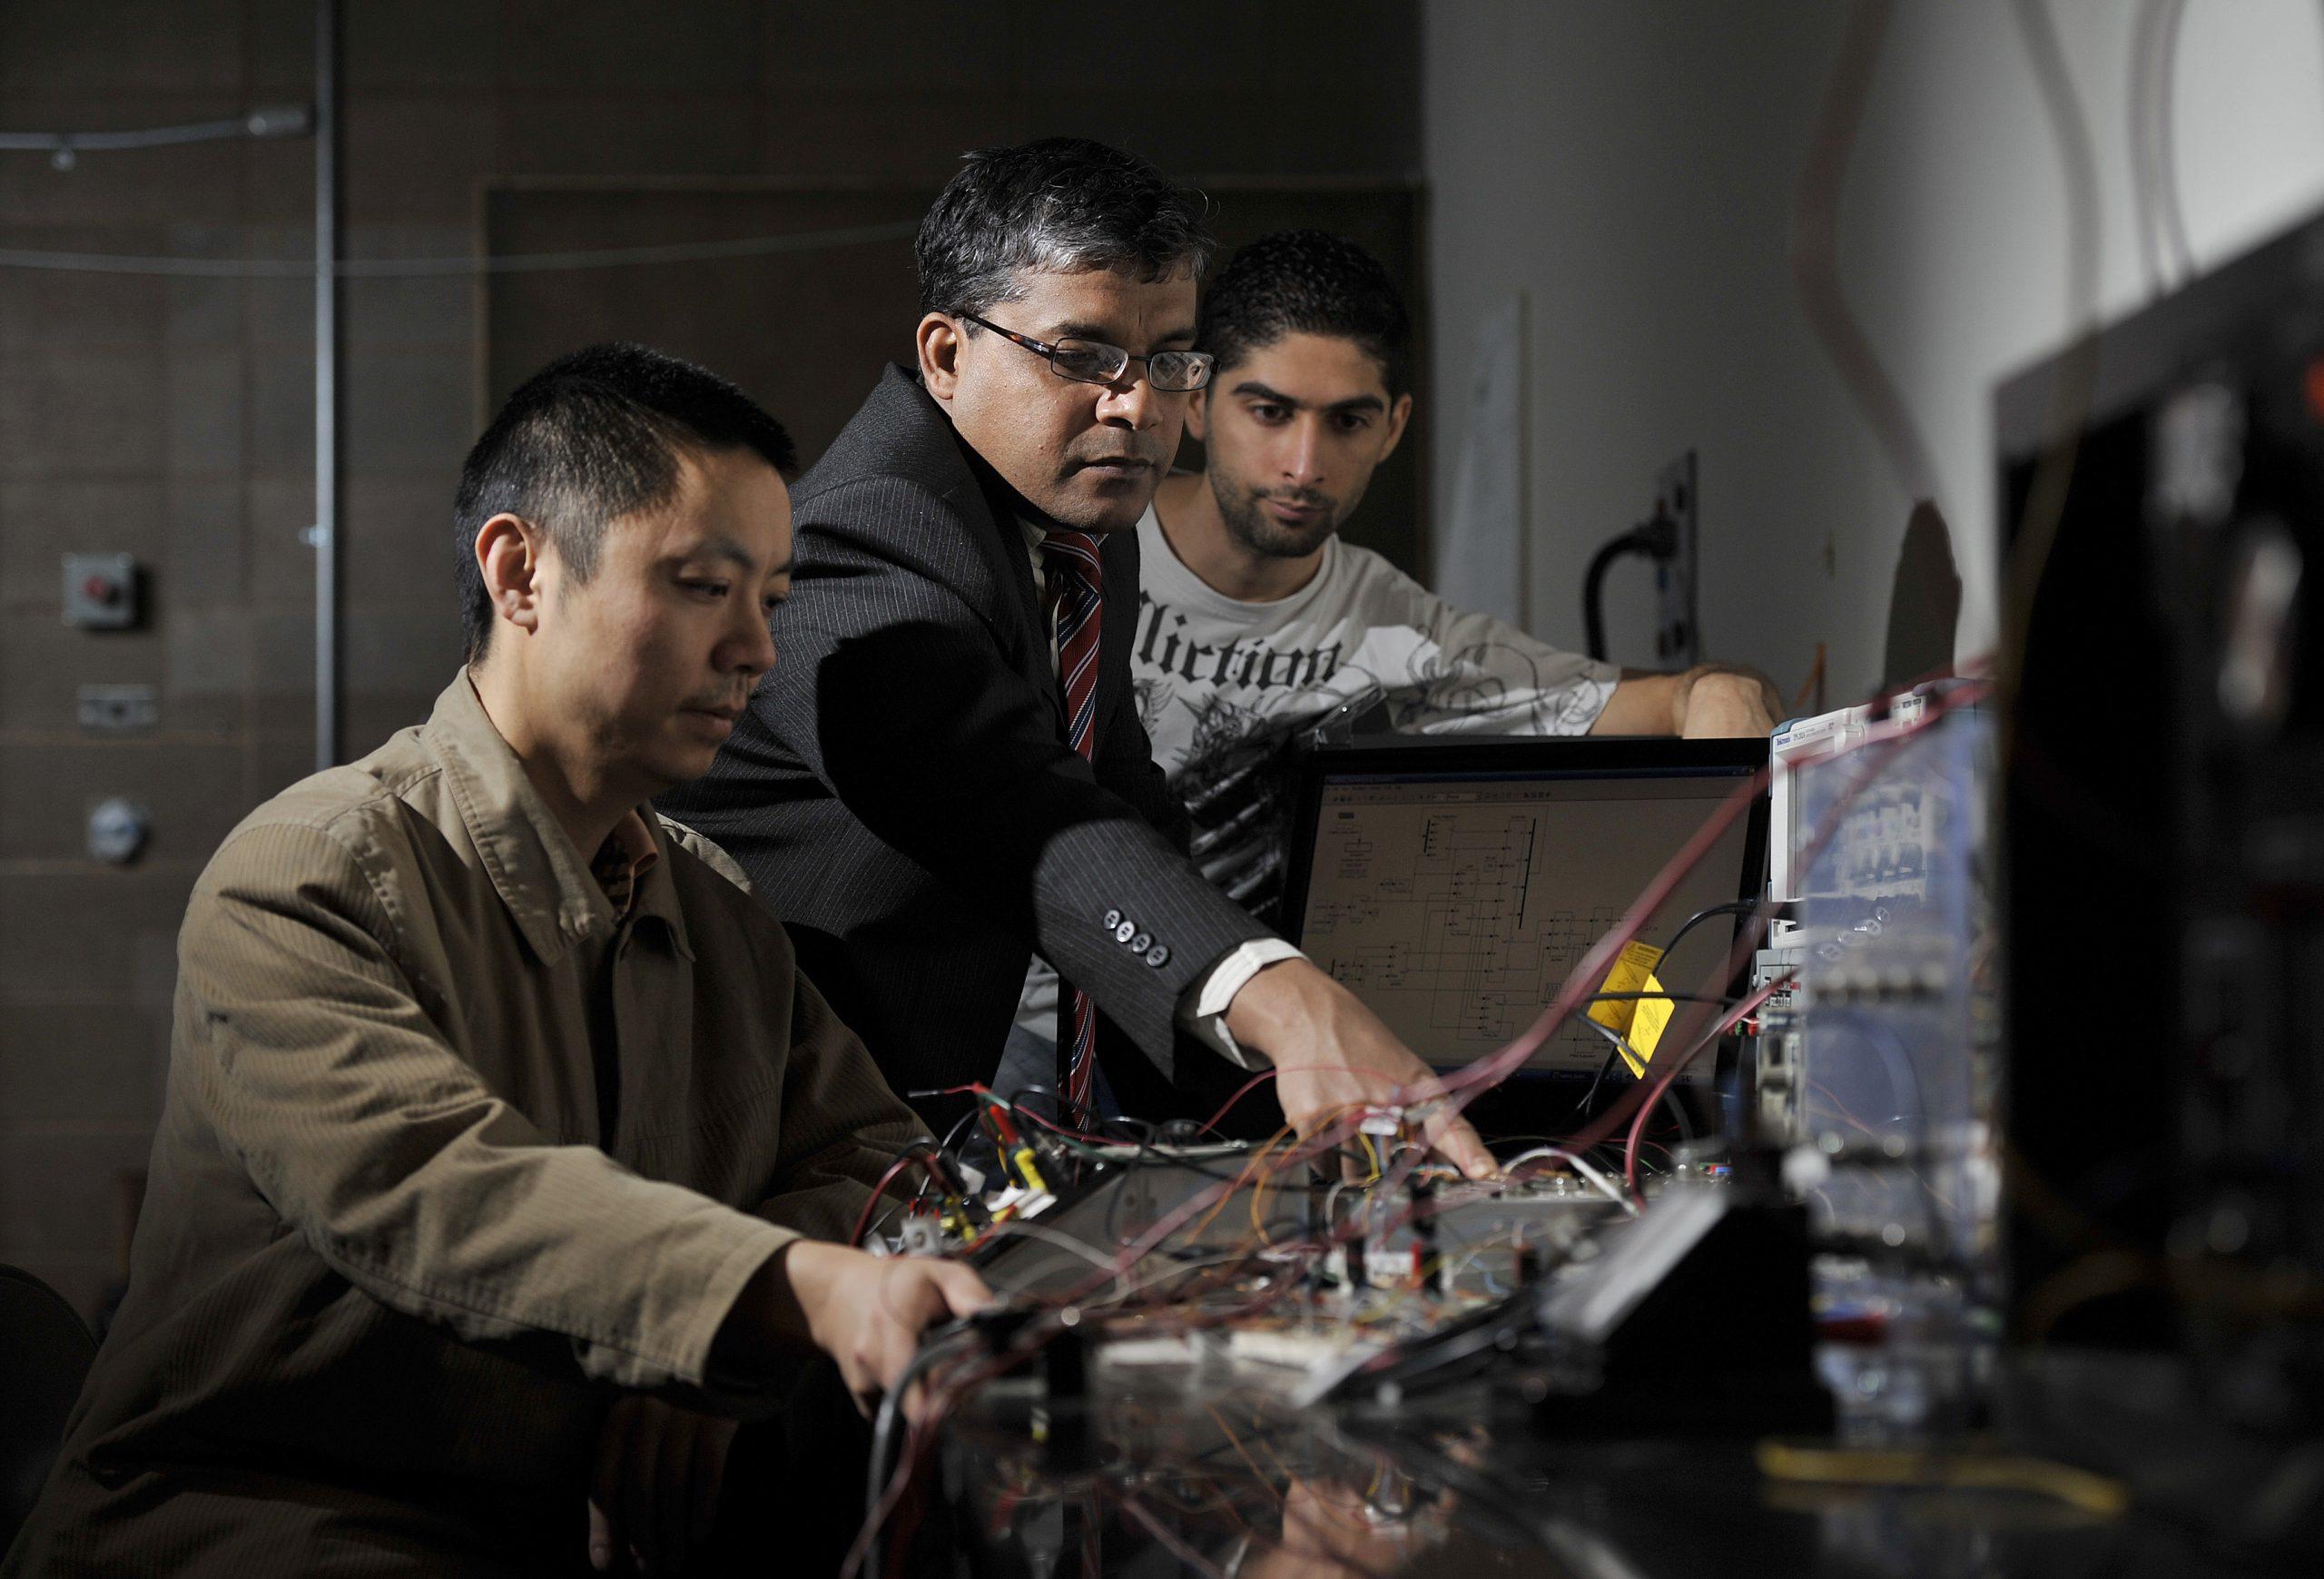 Professor helping students in engineering lab